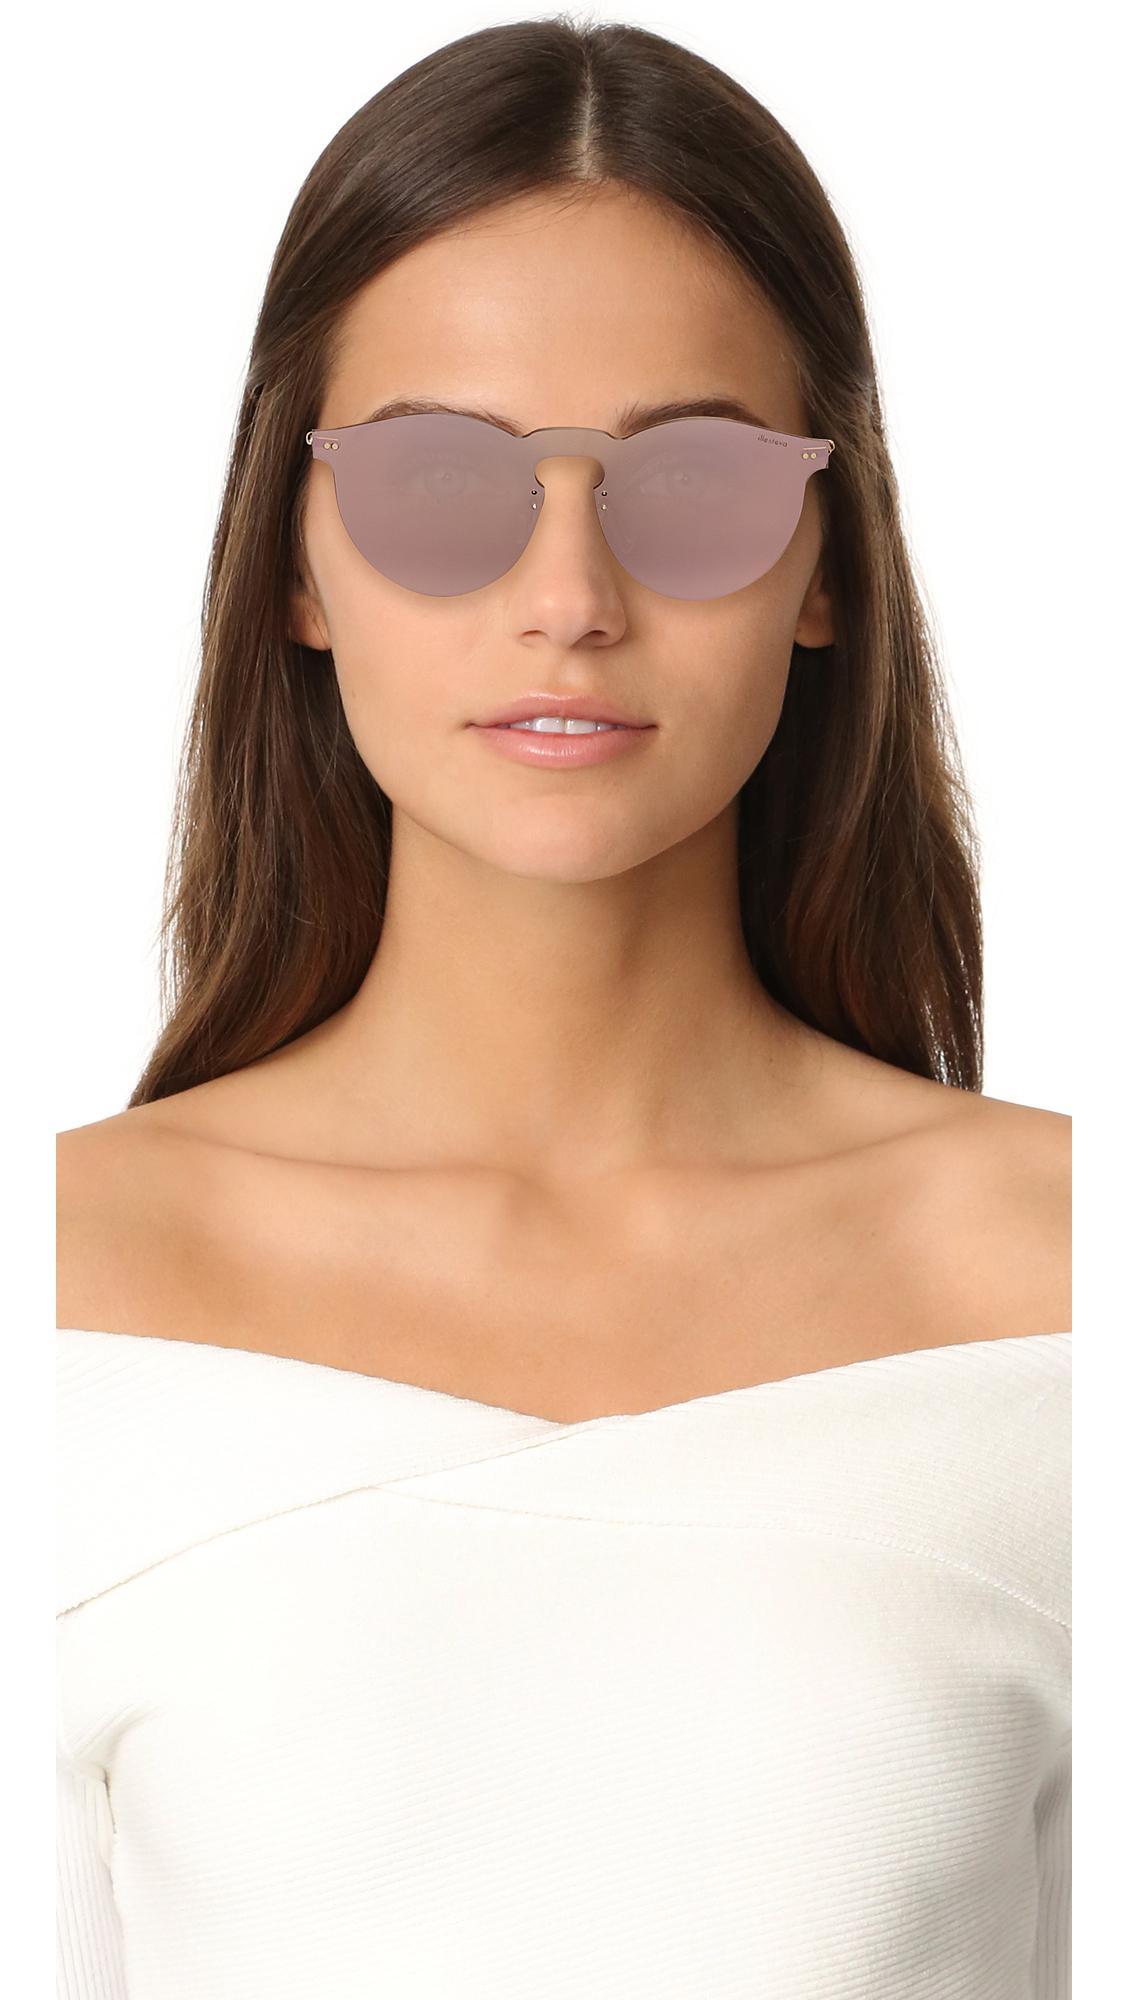 fc977d2f9c7 Lyst - Illesteva Leonard Mask Sunglasses in Pink